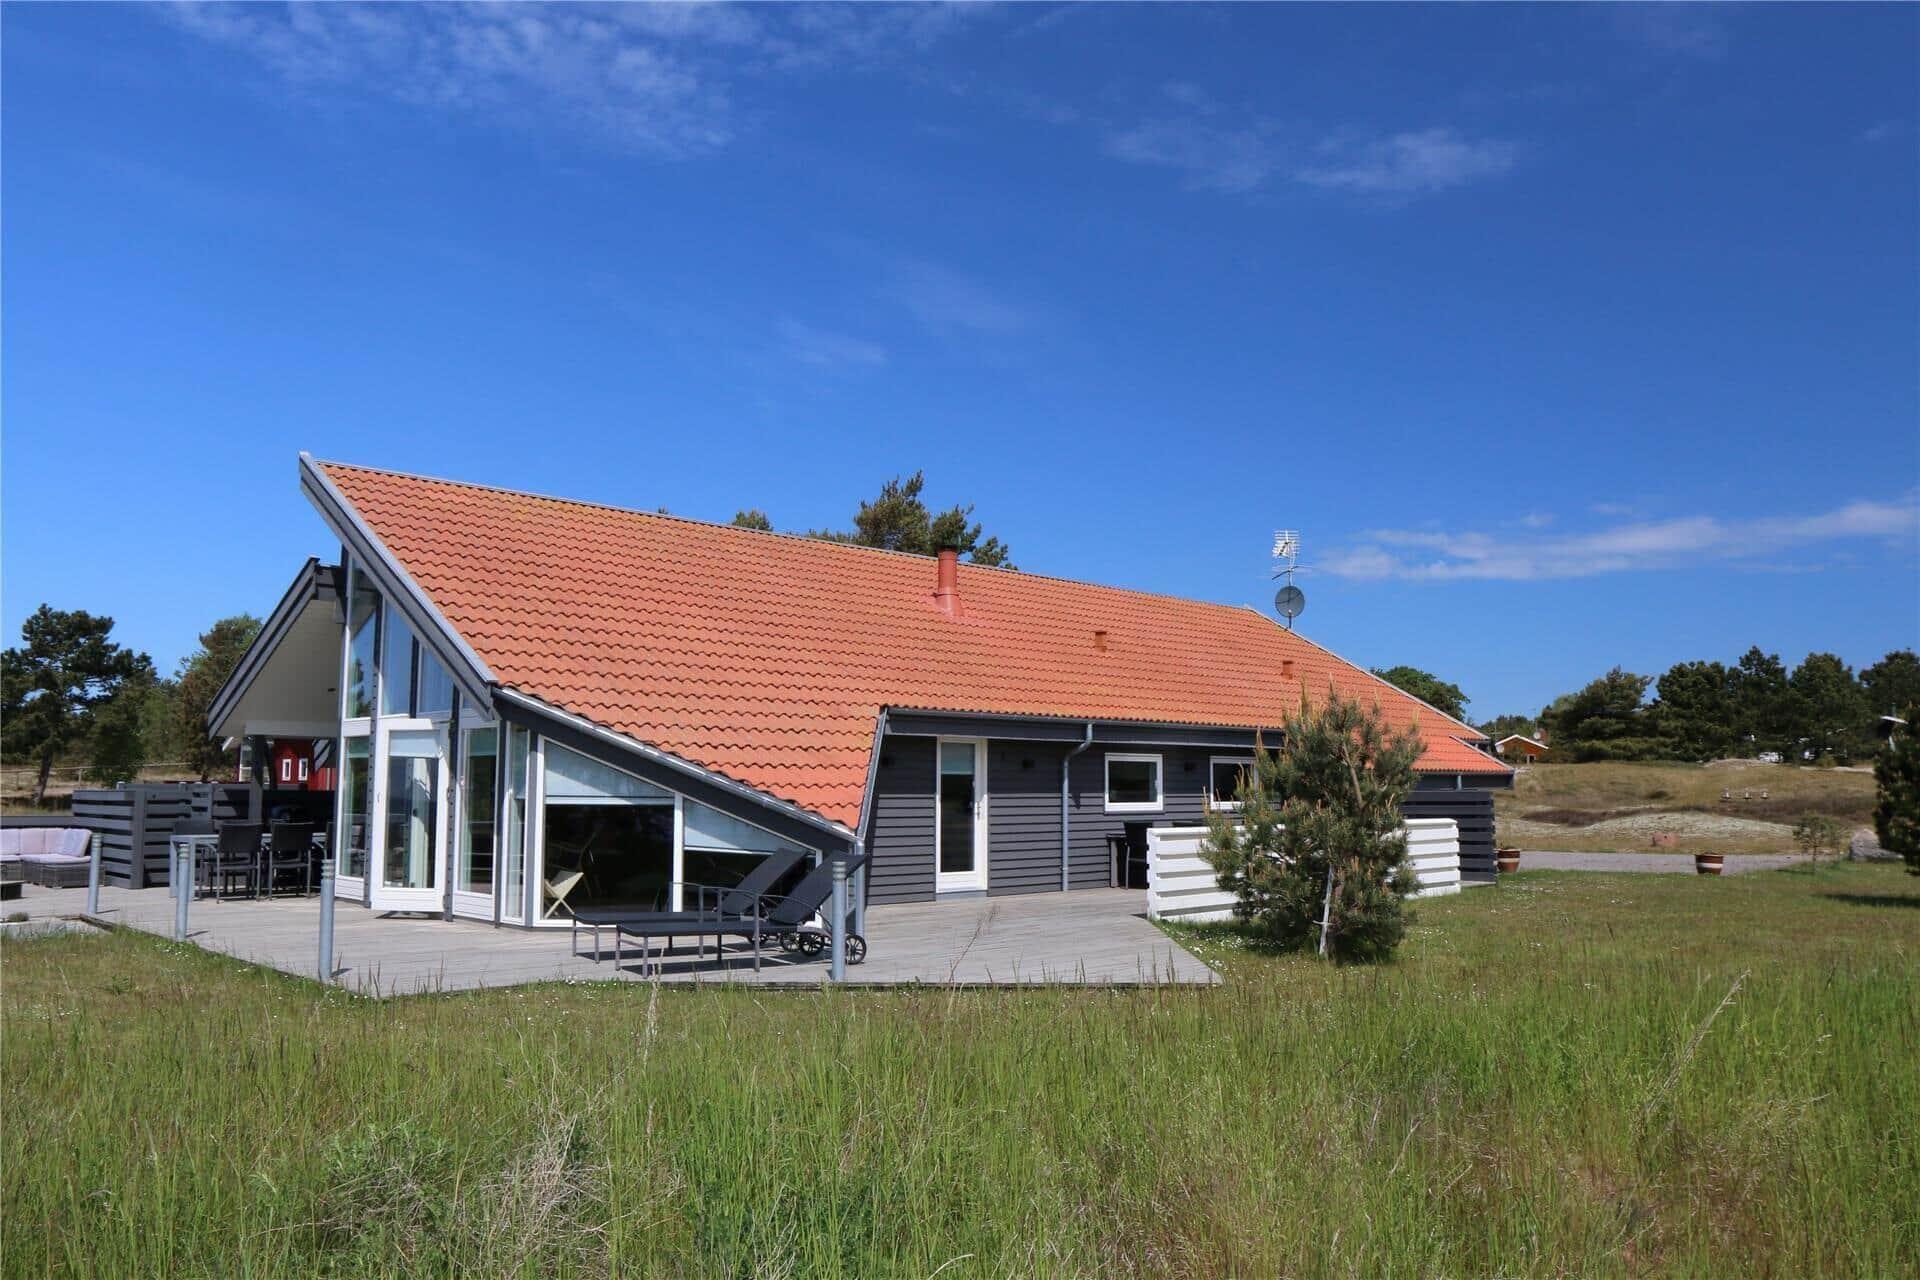 Image 1-10 Holiday-home 1405, Holsteroddevej 22, DK - 3720 Aakirkeby